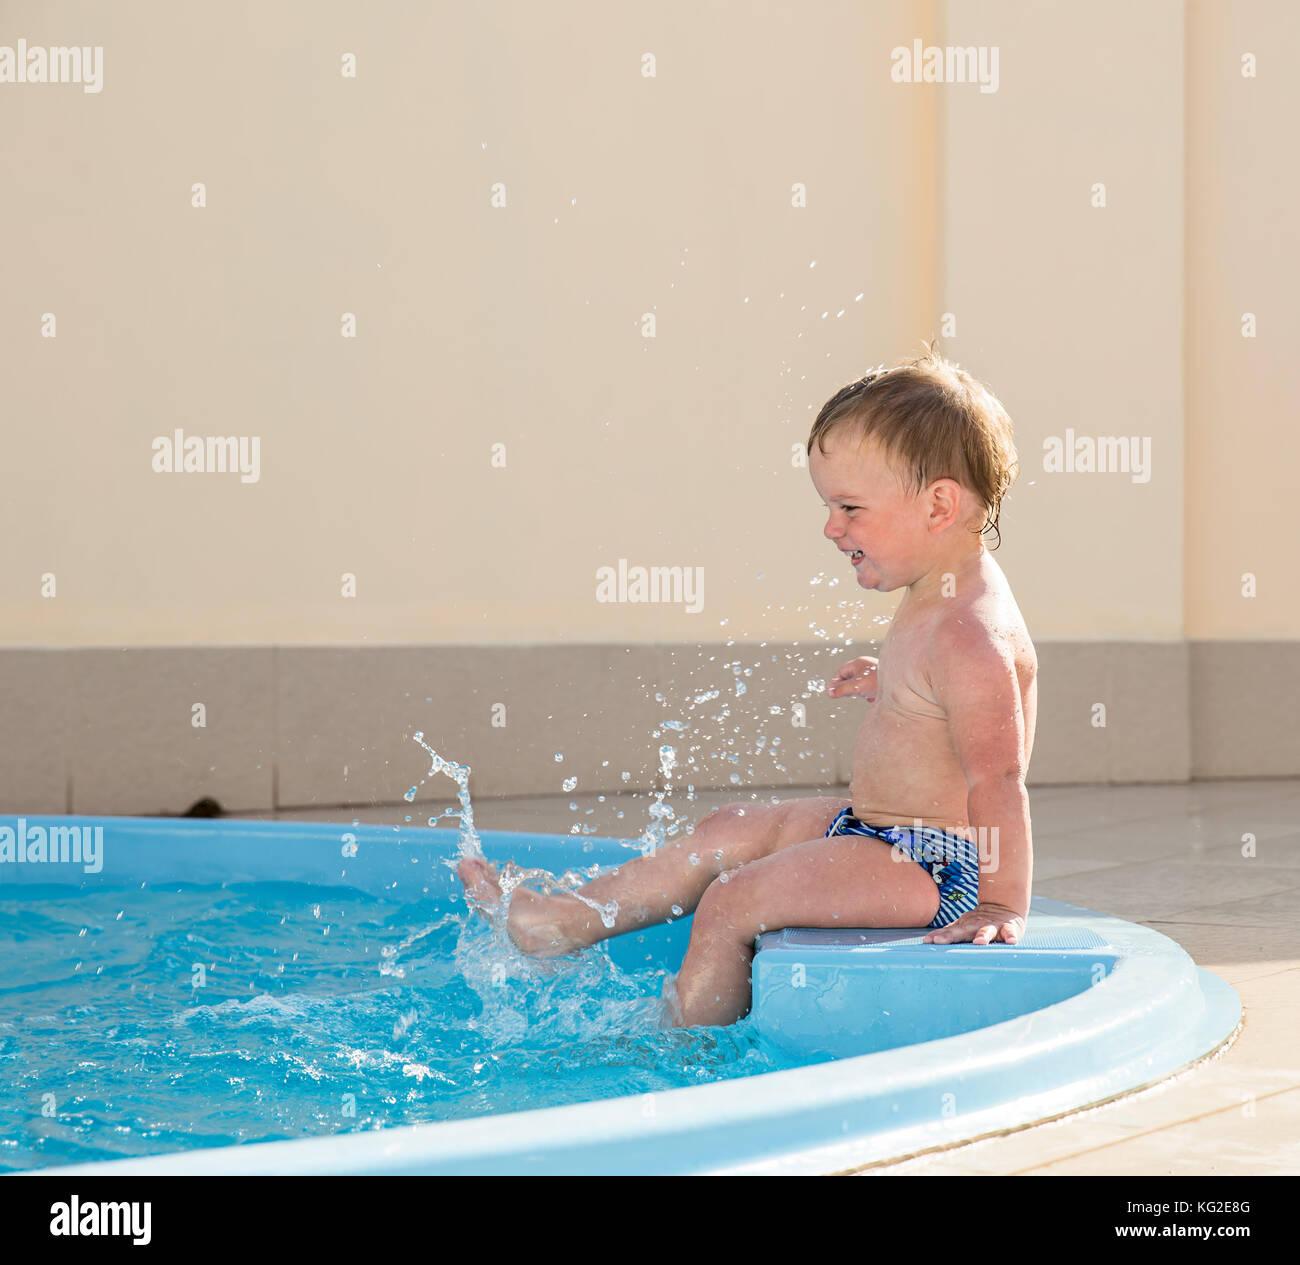 Pool Water Splash: Old People Swimming Pool Stock Photos & Old People